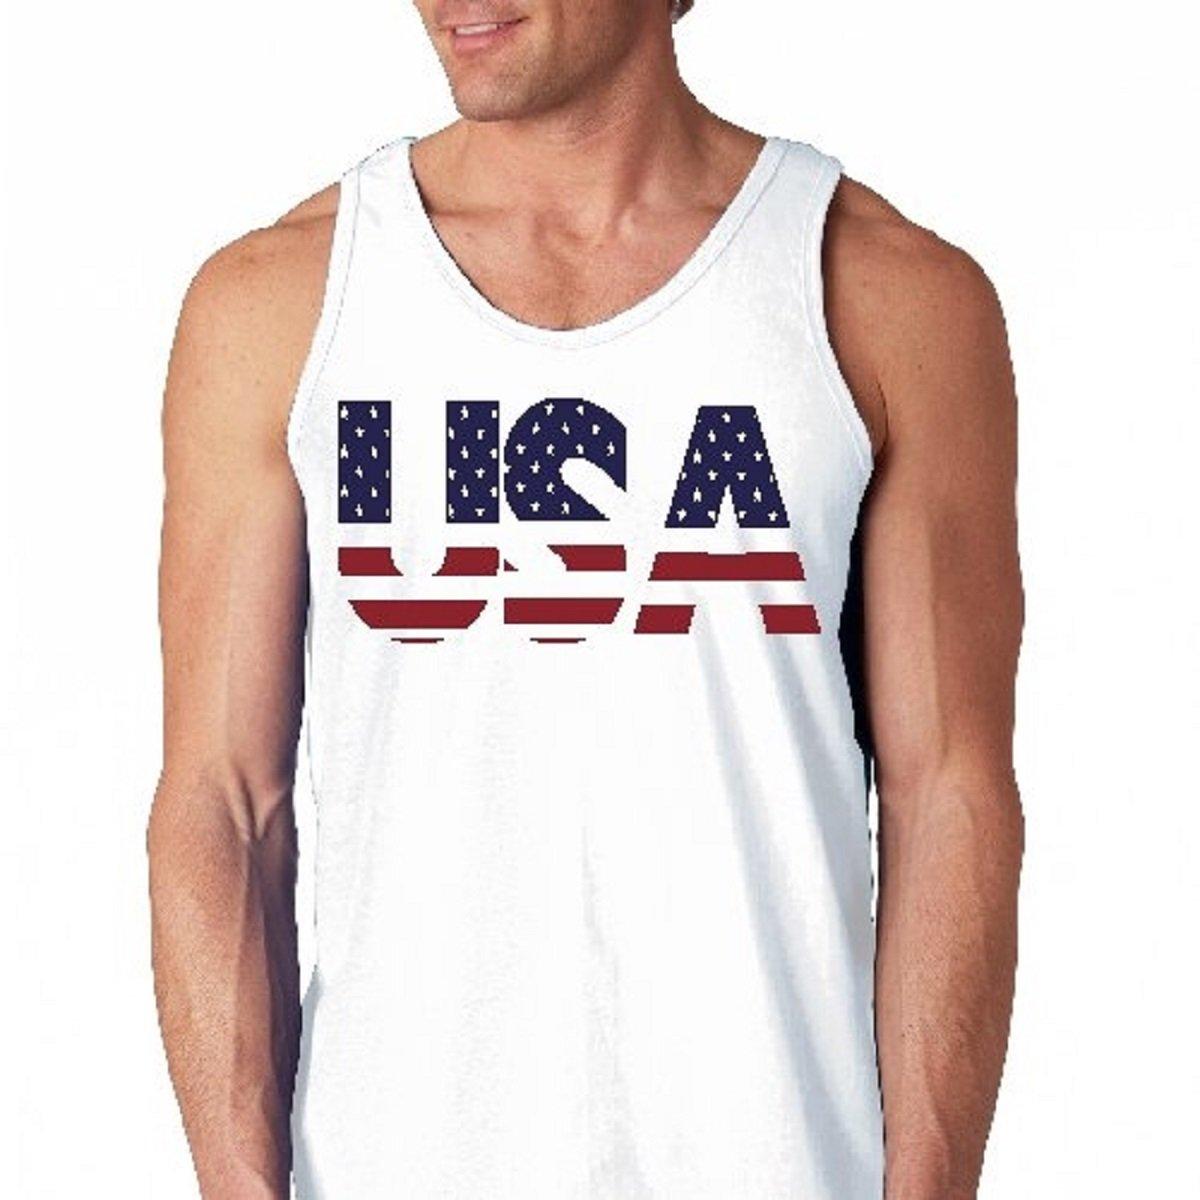 American Summer USA Bag Tank Top